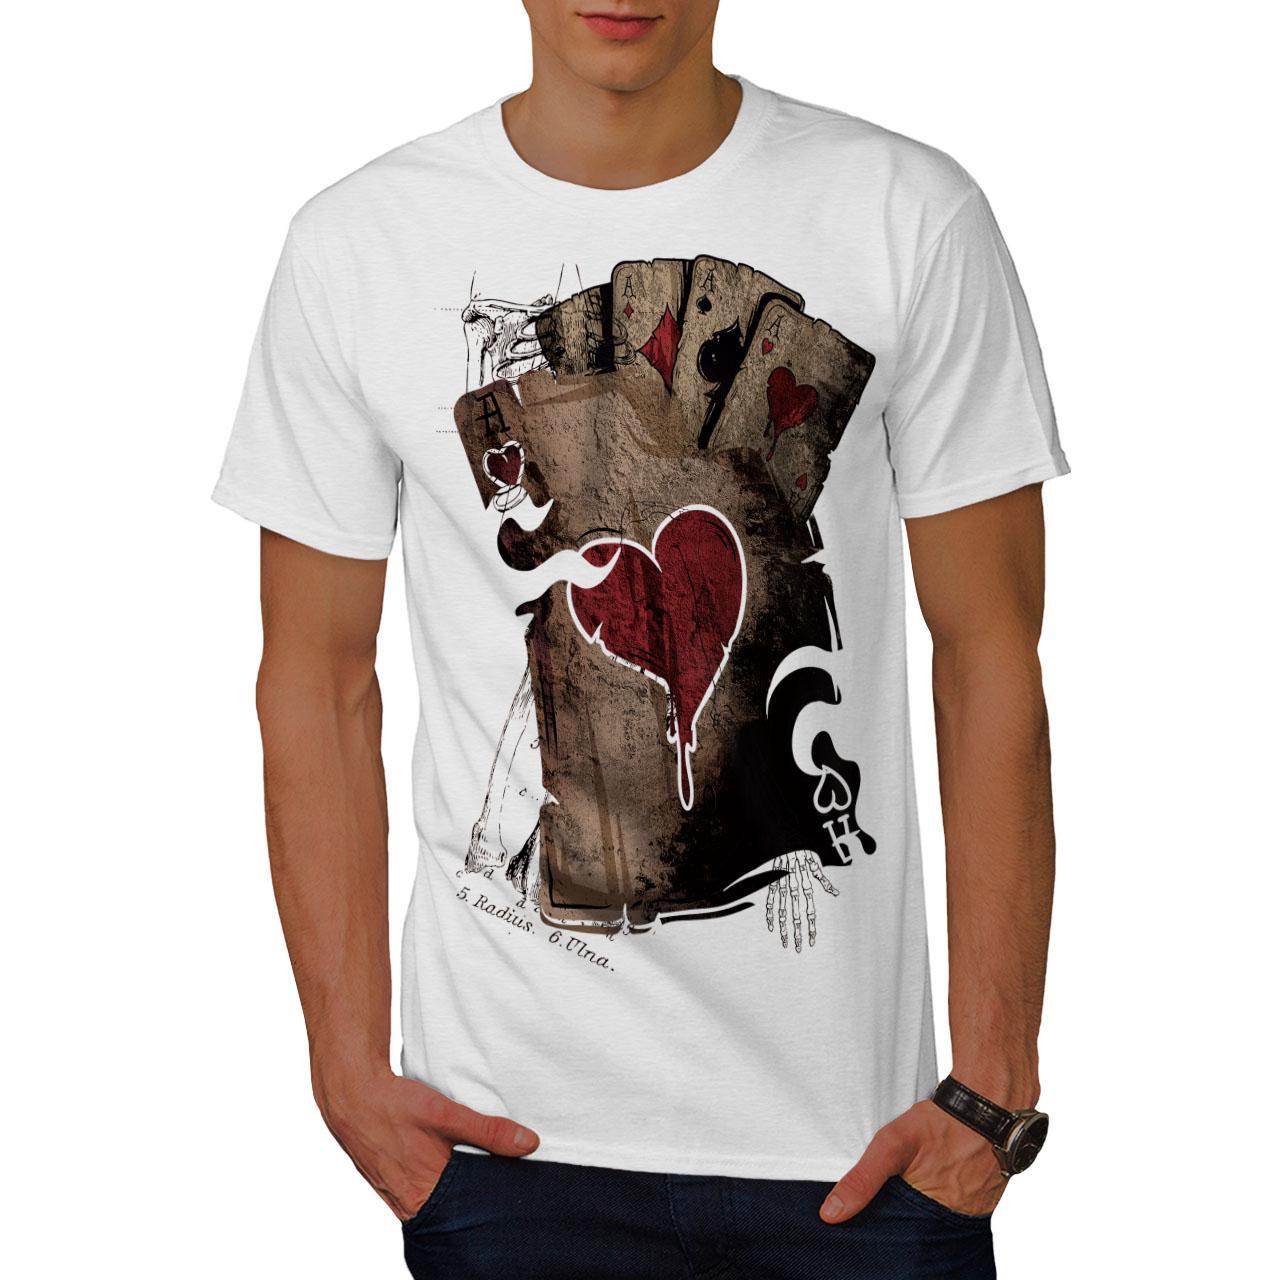 Wellcoda-Poker-Gamble-Squelette-T-shirt-homme-effrayant-conception-graphique-imprime-Tee miniature 9